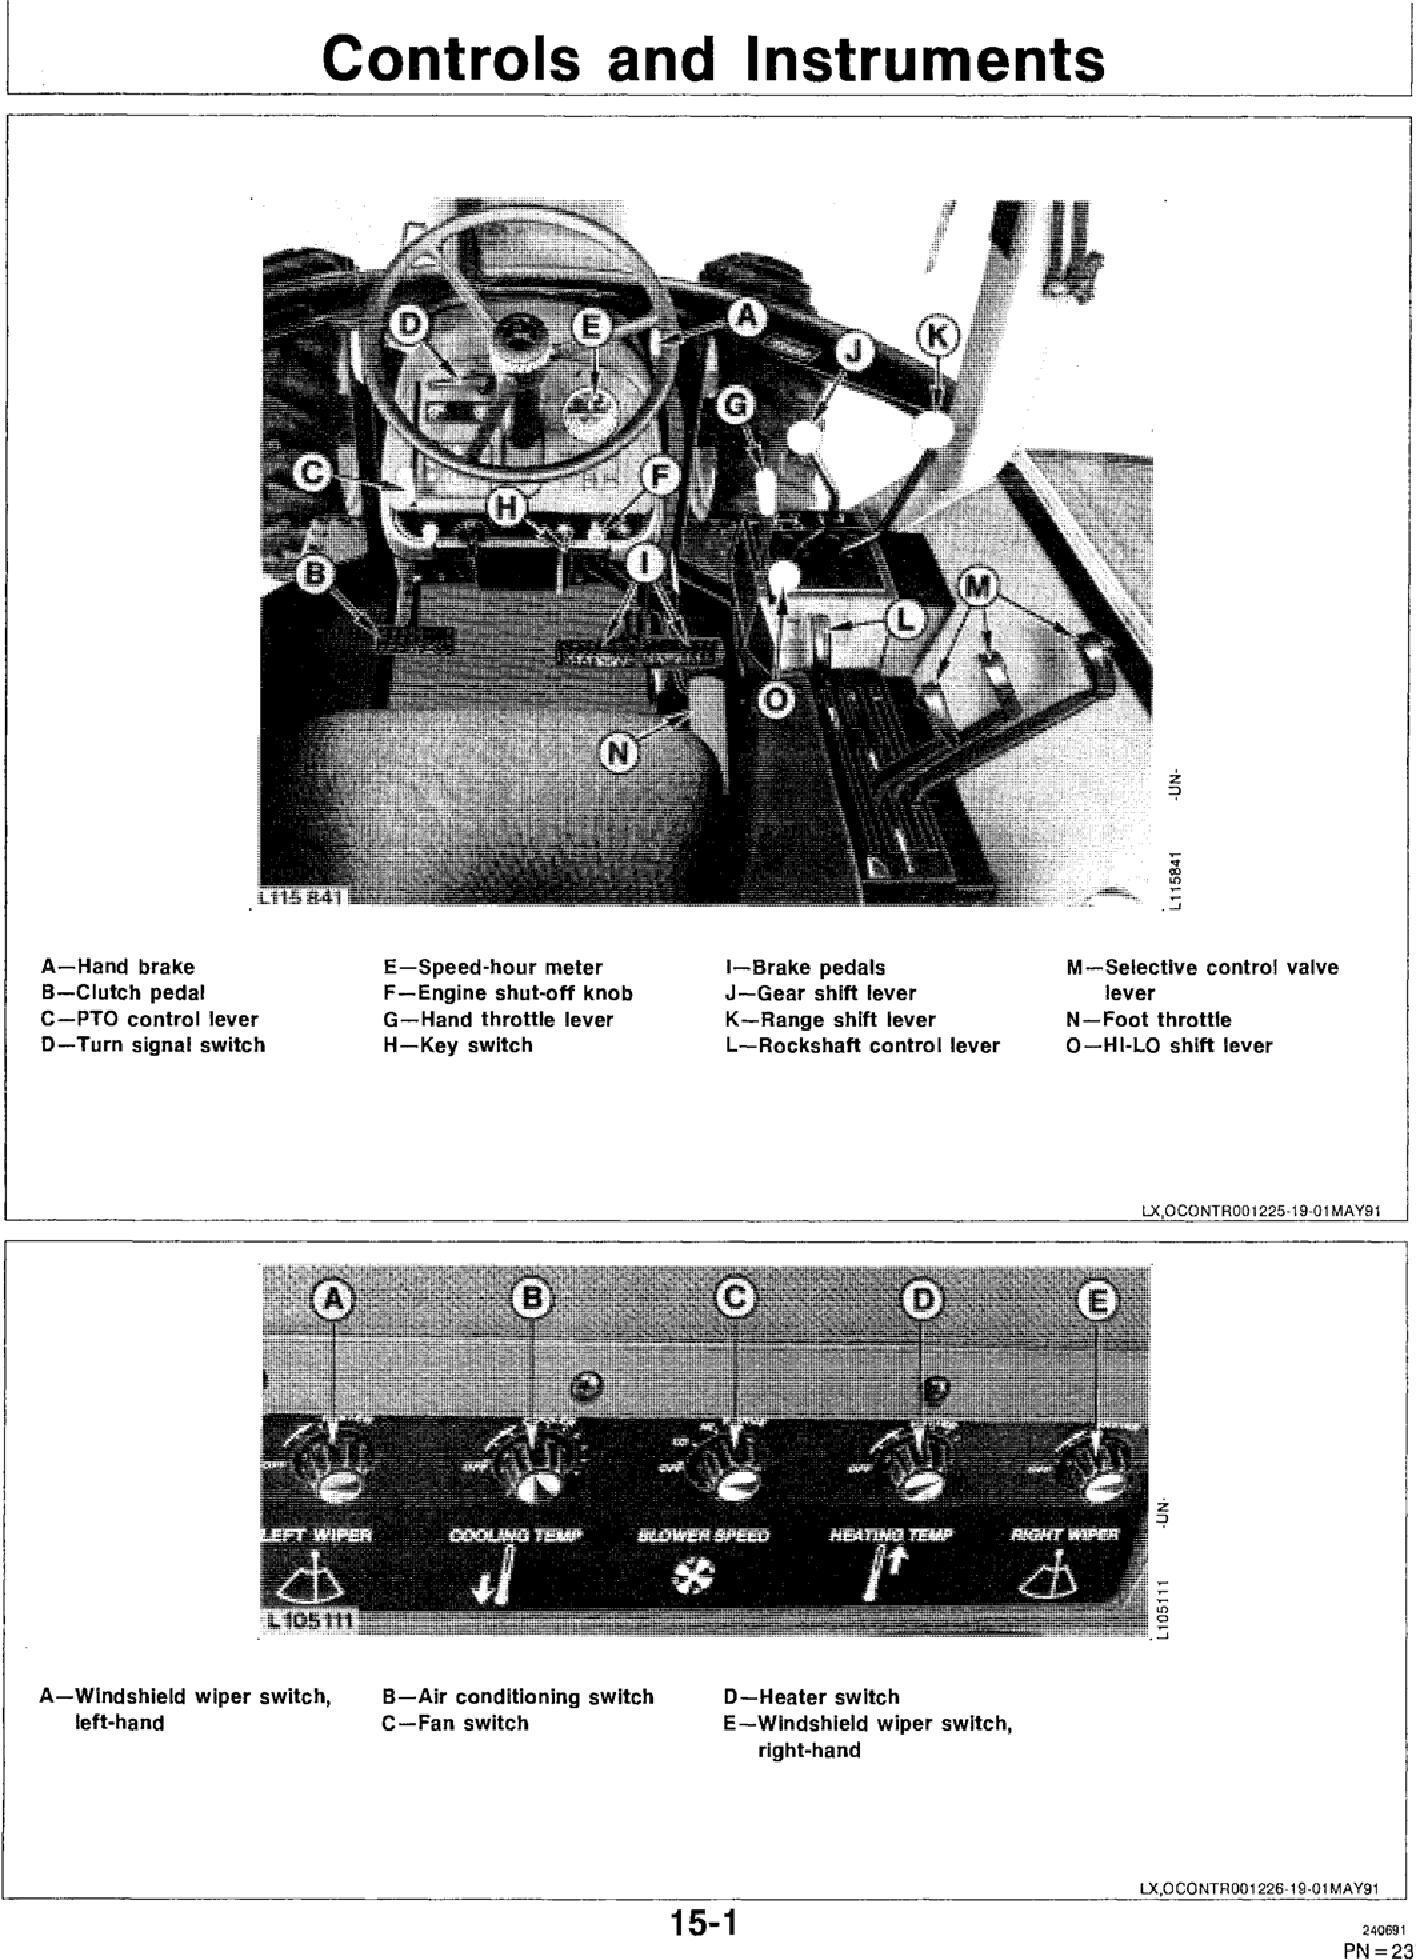 OML64489 - JD John Deere 3055, 3255 Tractors Operator`s Manual - 2